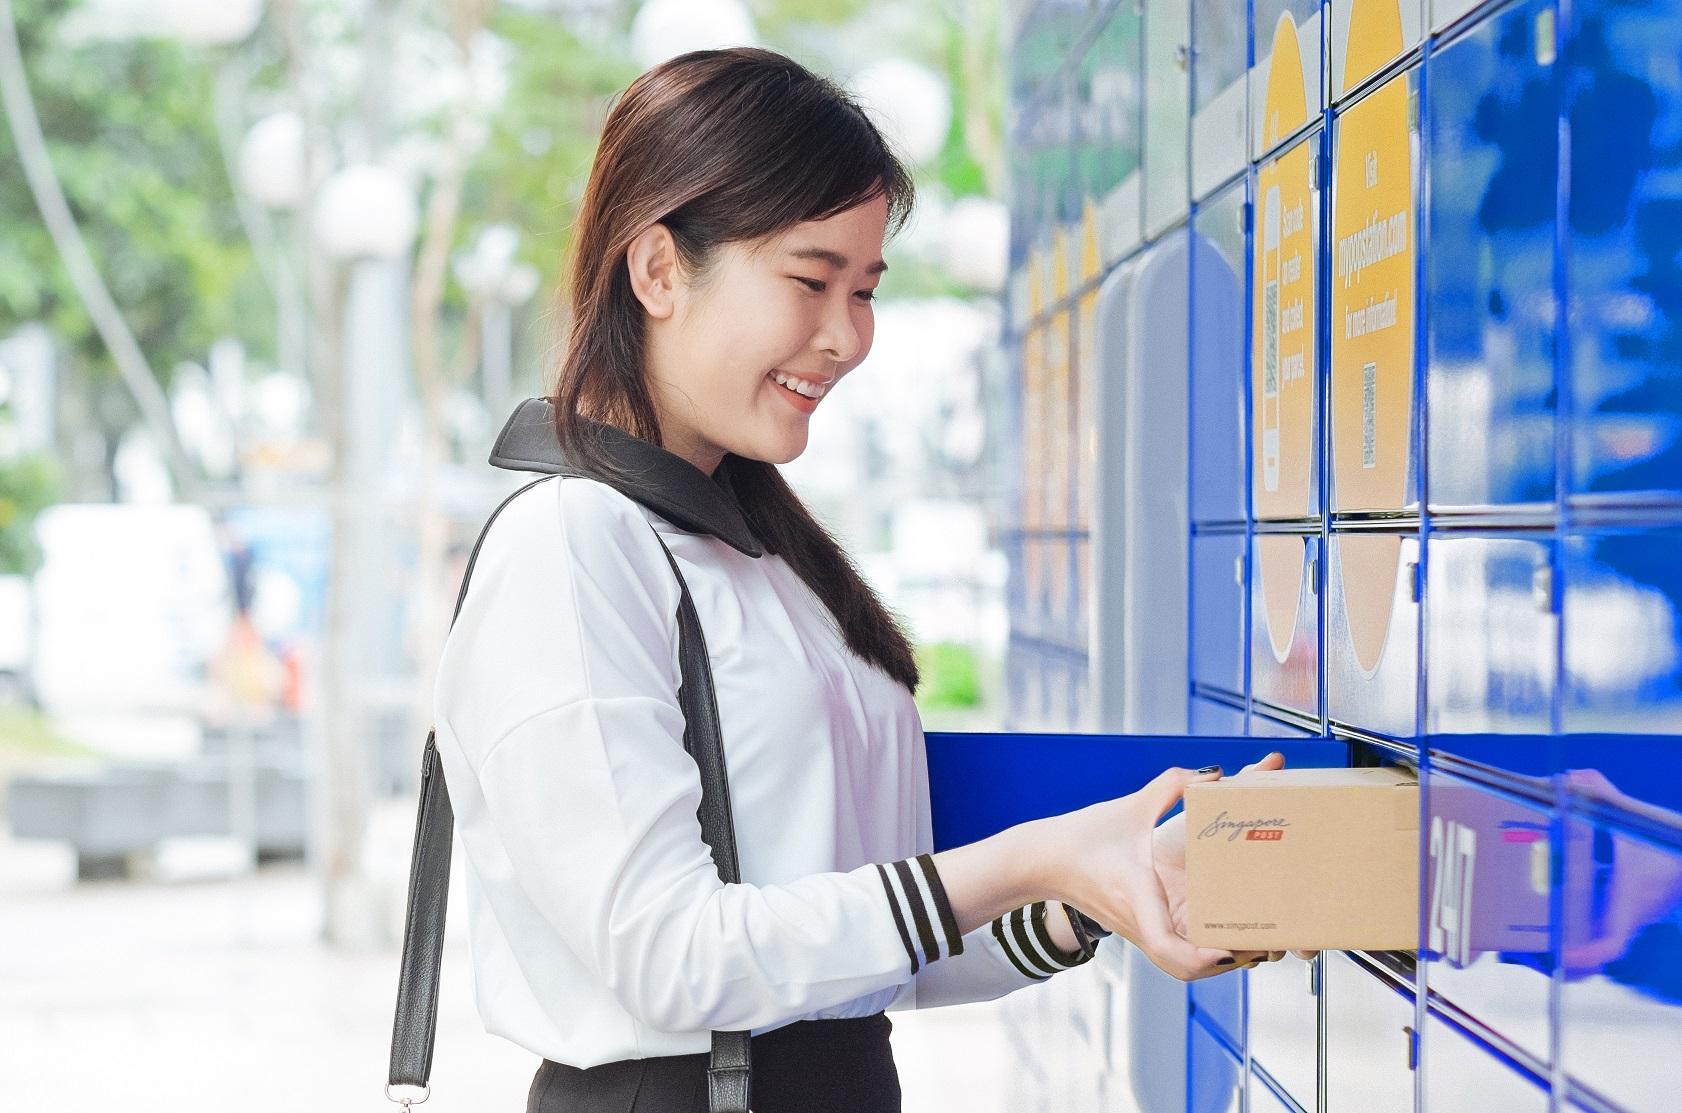 SingPost introduces Singapore's first islandwide open parcel locker service